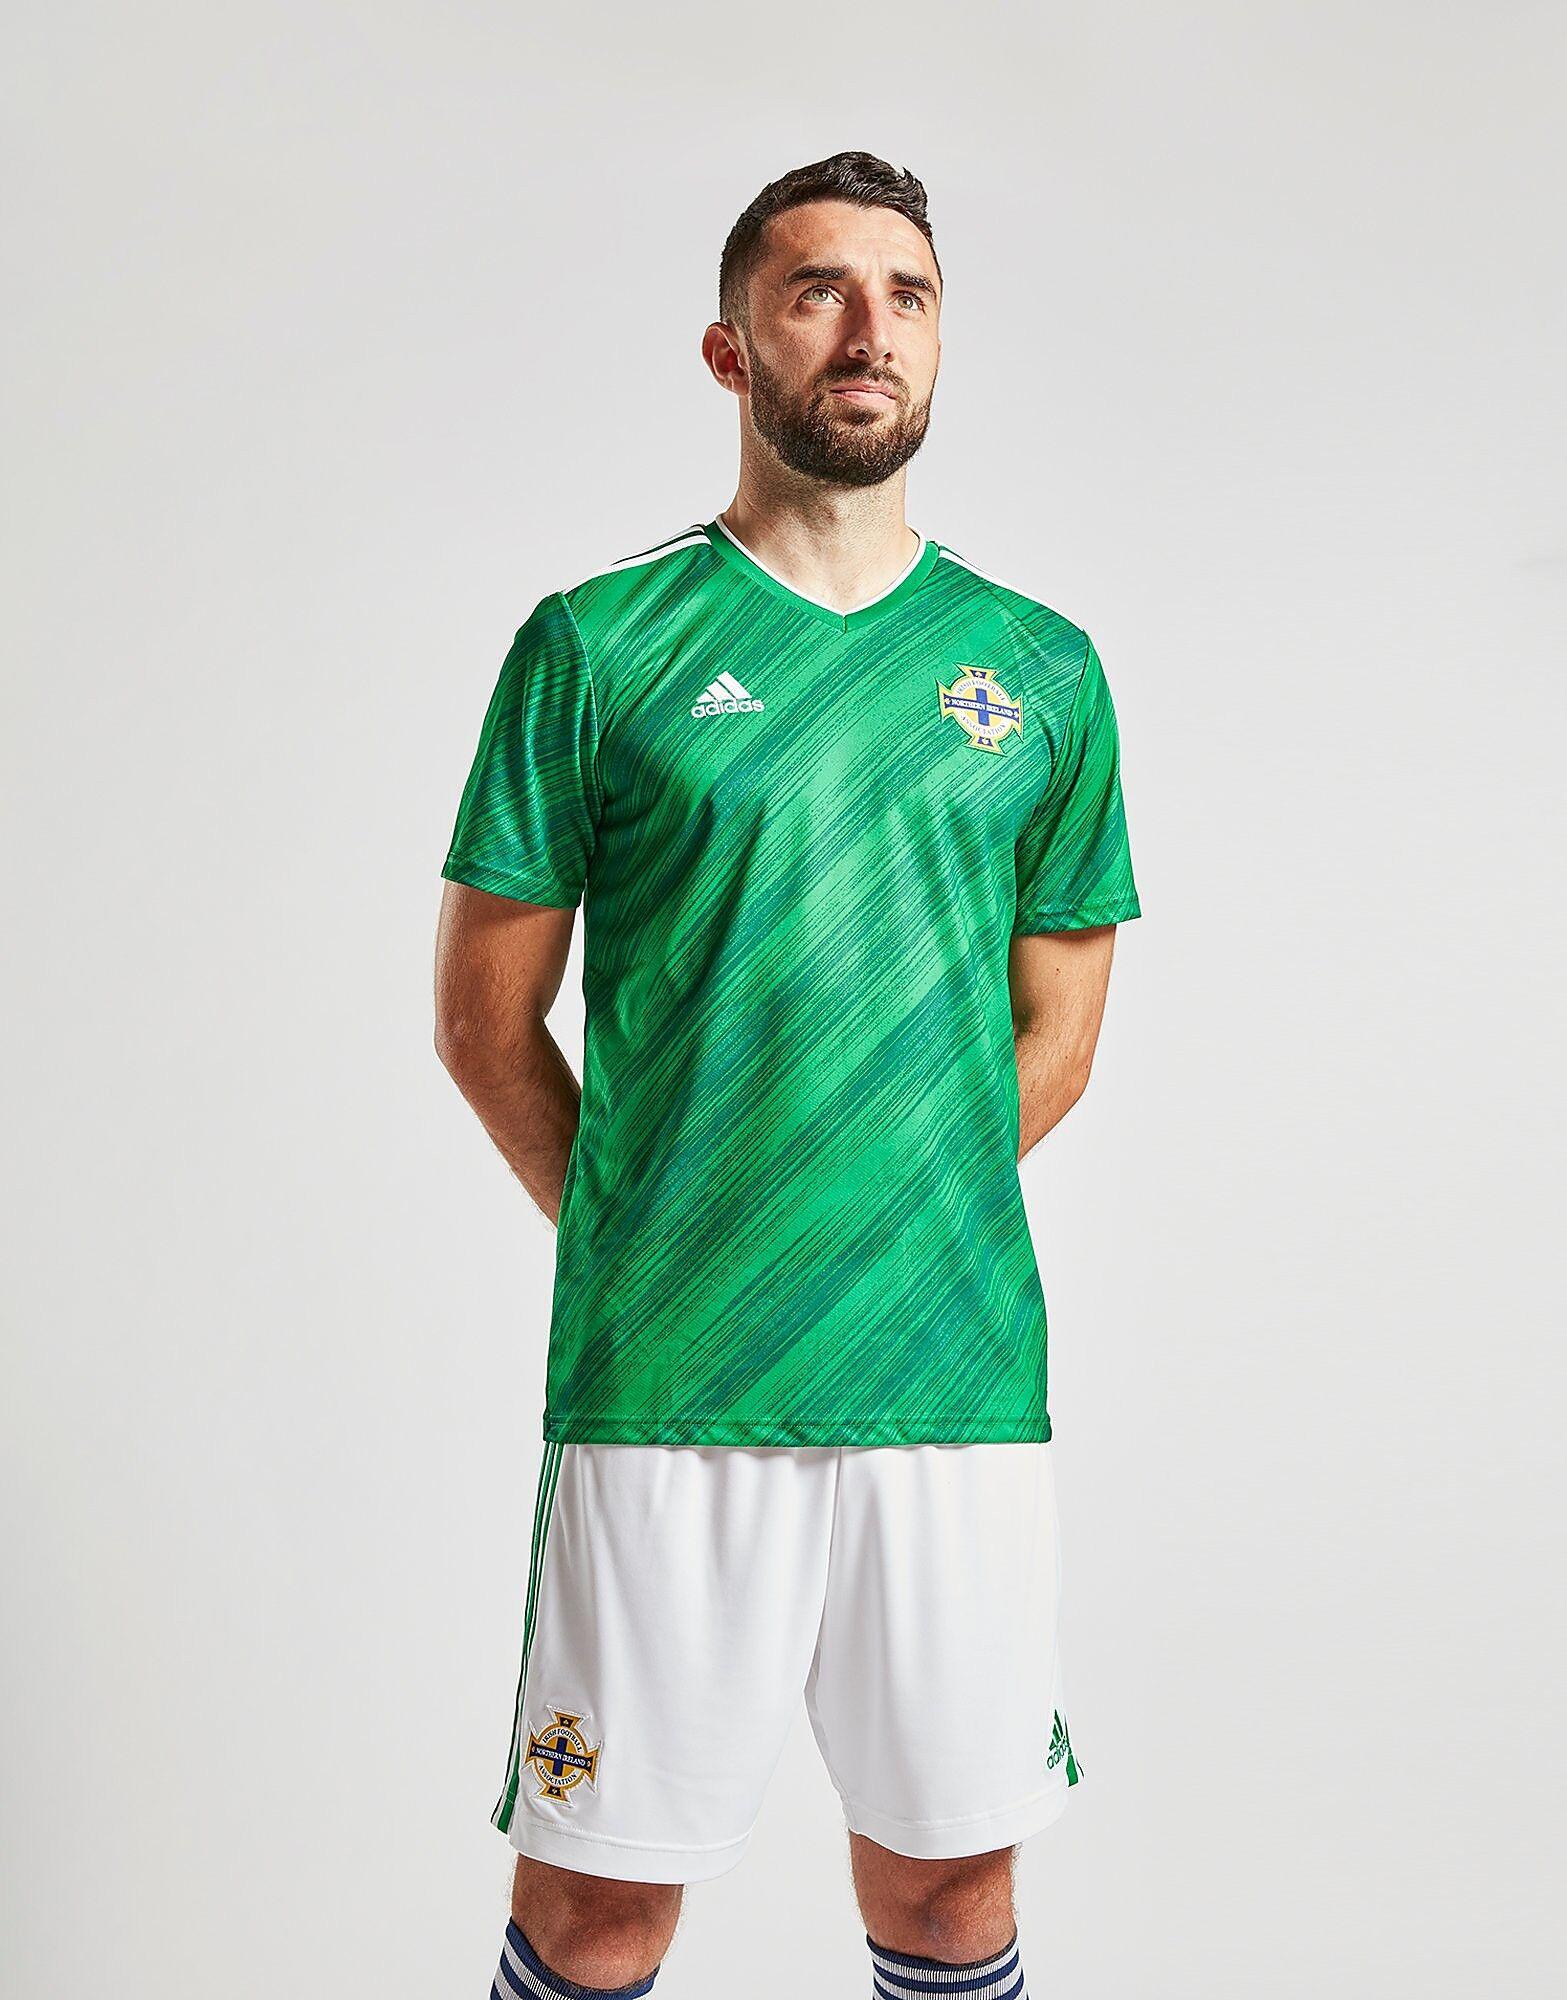 Image of Adidas Northern Ireland 2020 Kotipaita Miehet - Mens, Vihreä